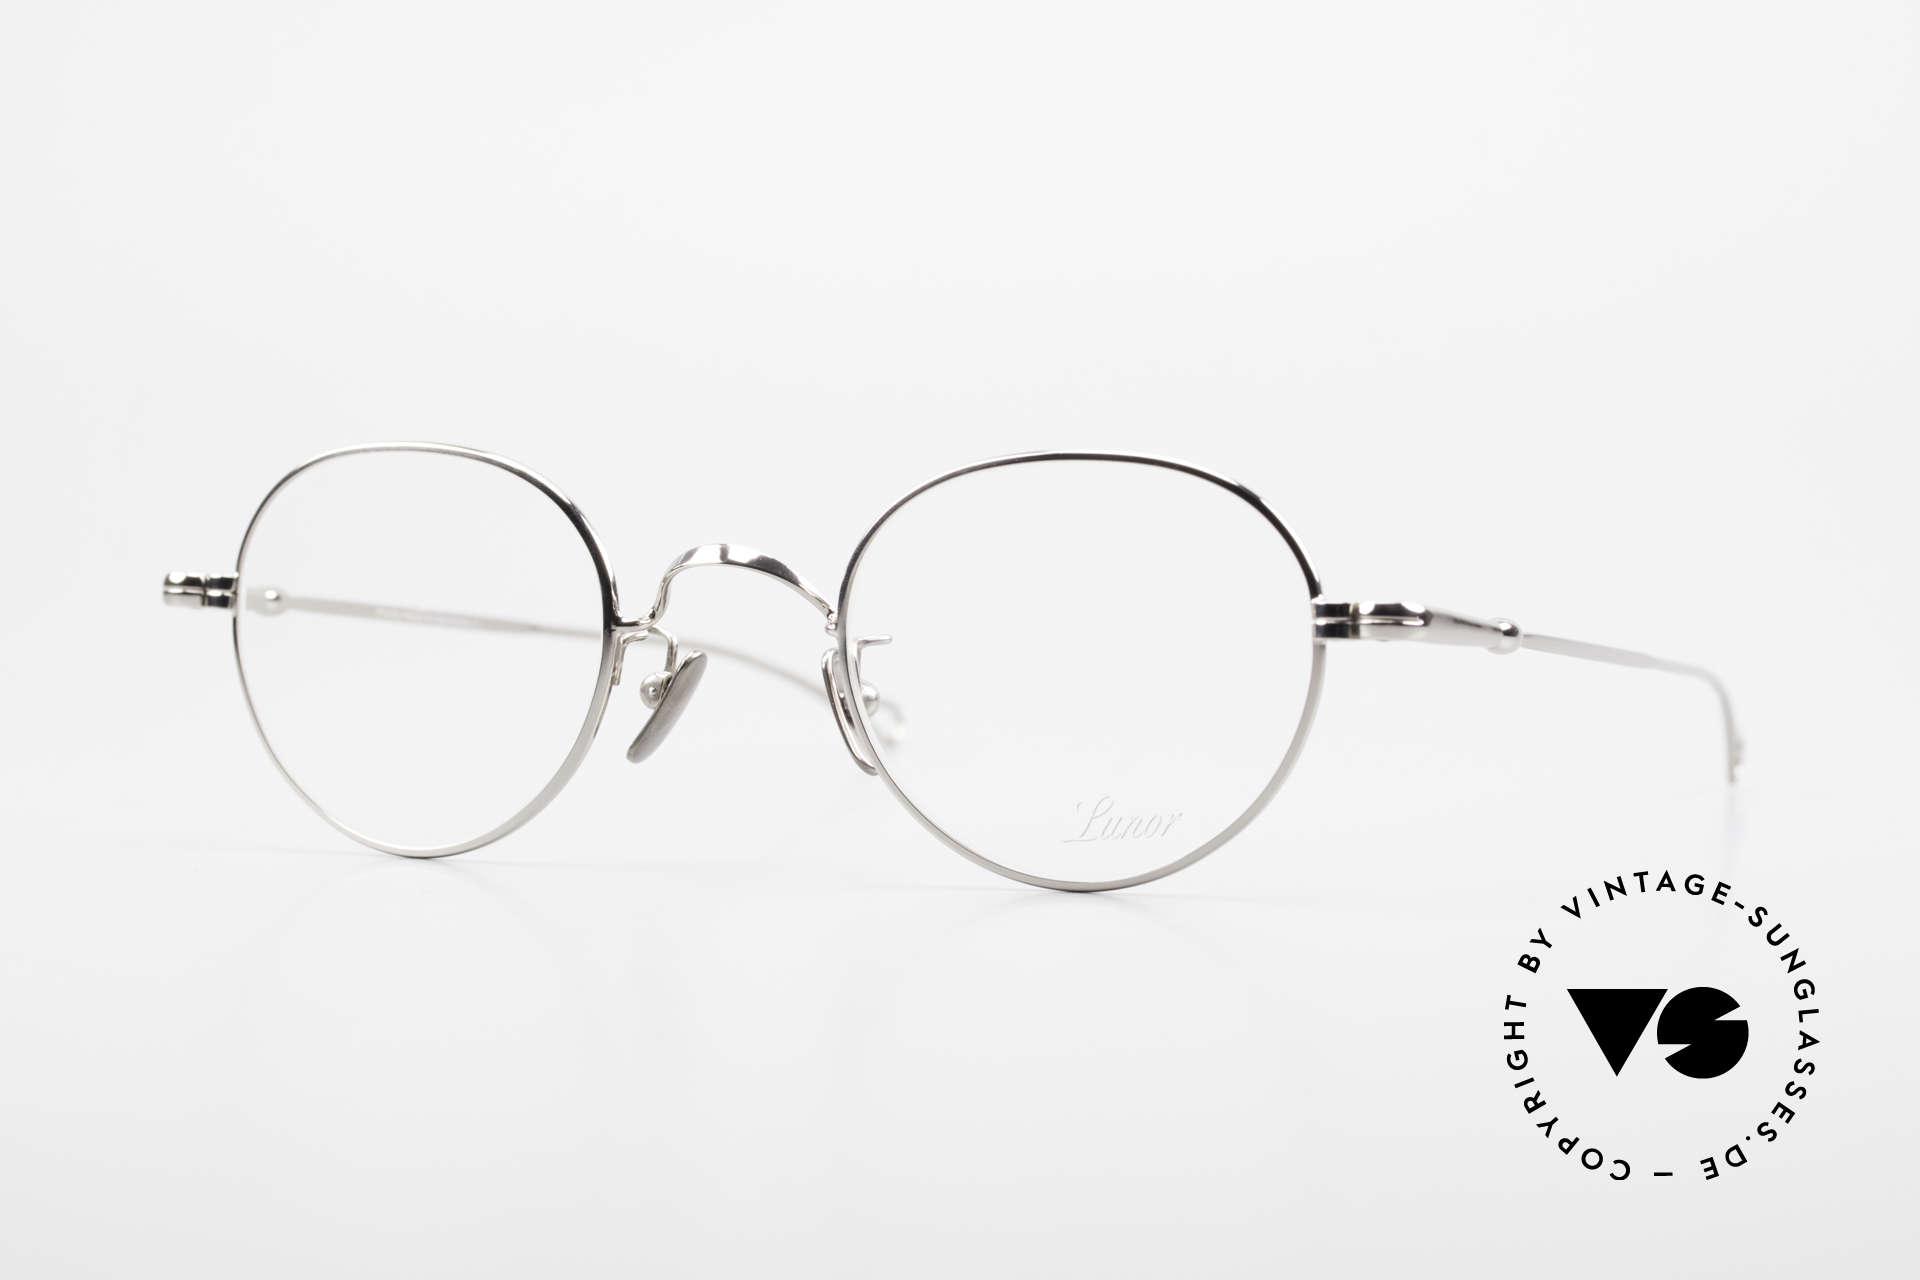 Lunor V 108 Panto Frame Platinum Plated, LUNOR: honest craftsmanship with attention to details, Made for Men